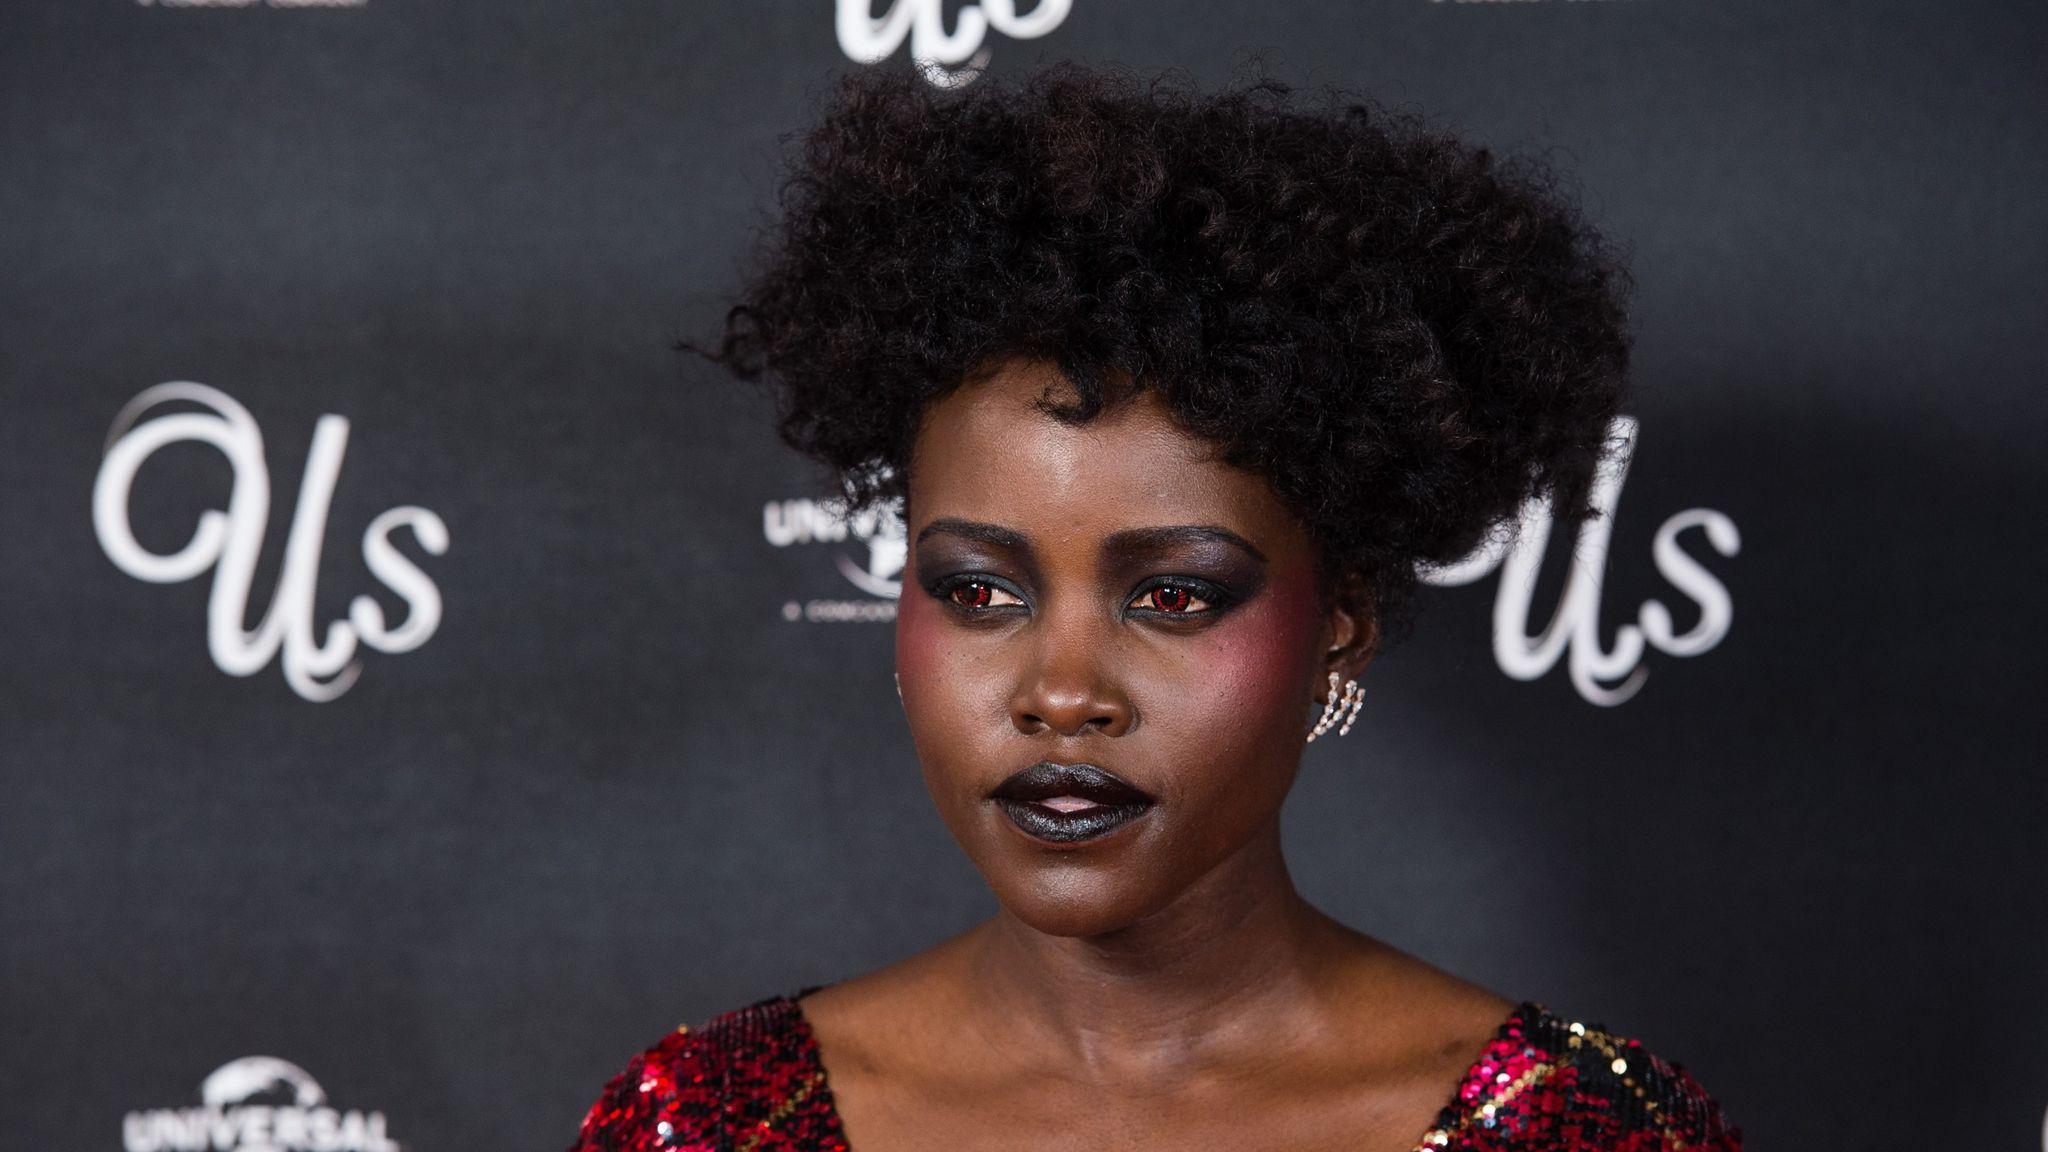 Lupita Nyong O Hails Refreshing Portrayal Of Black Families In New Movie Us Ents Arts News Sky News